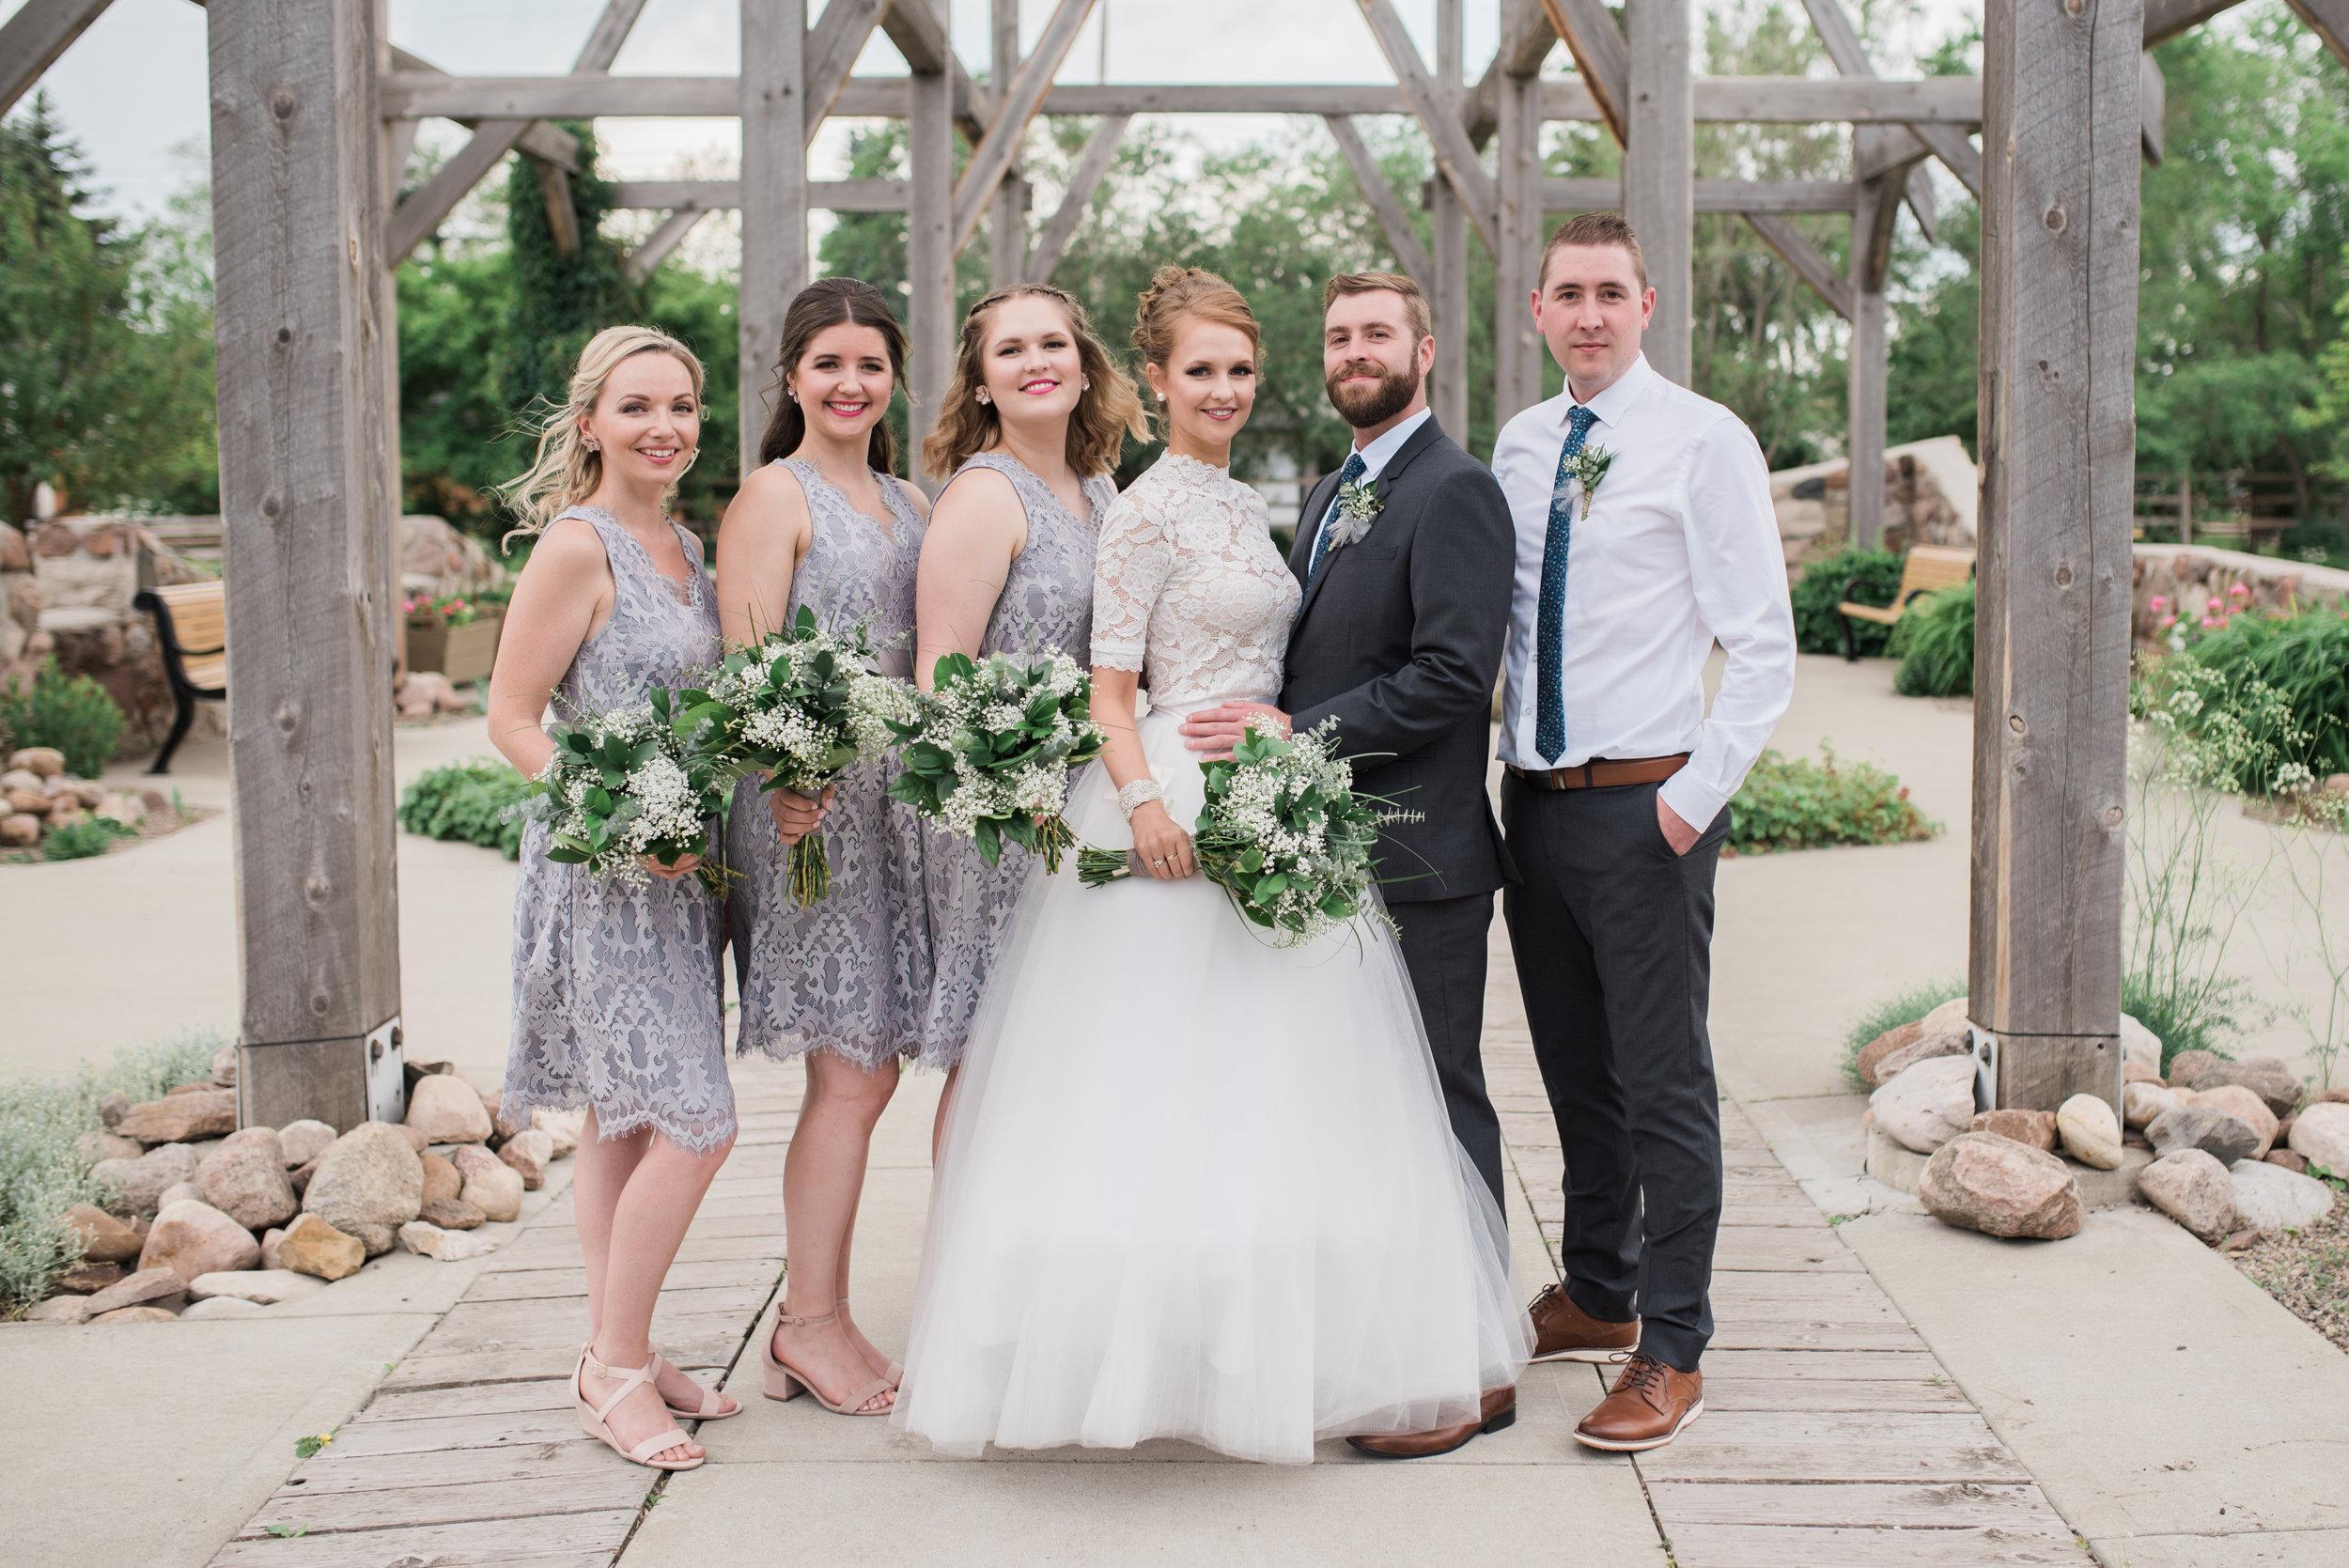 Elgert Wedding 1022.jpg